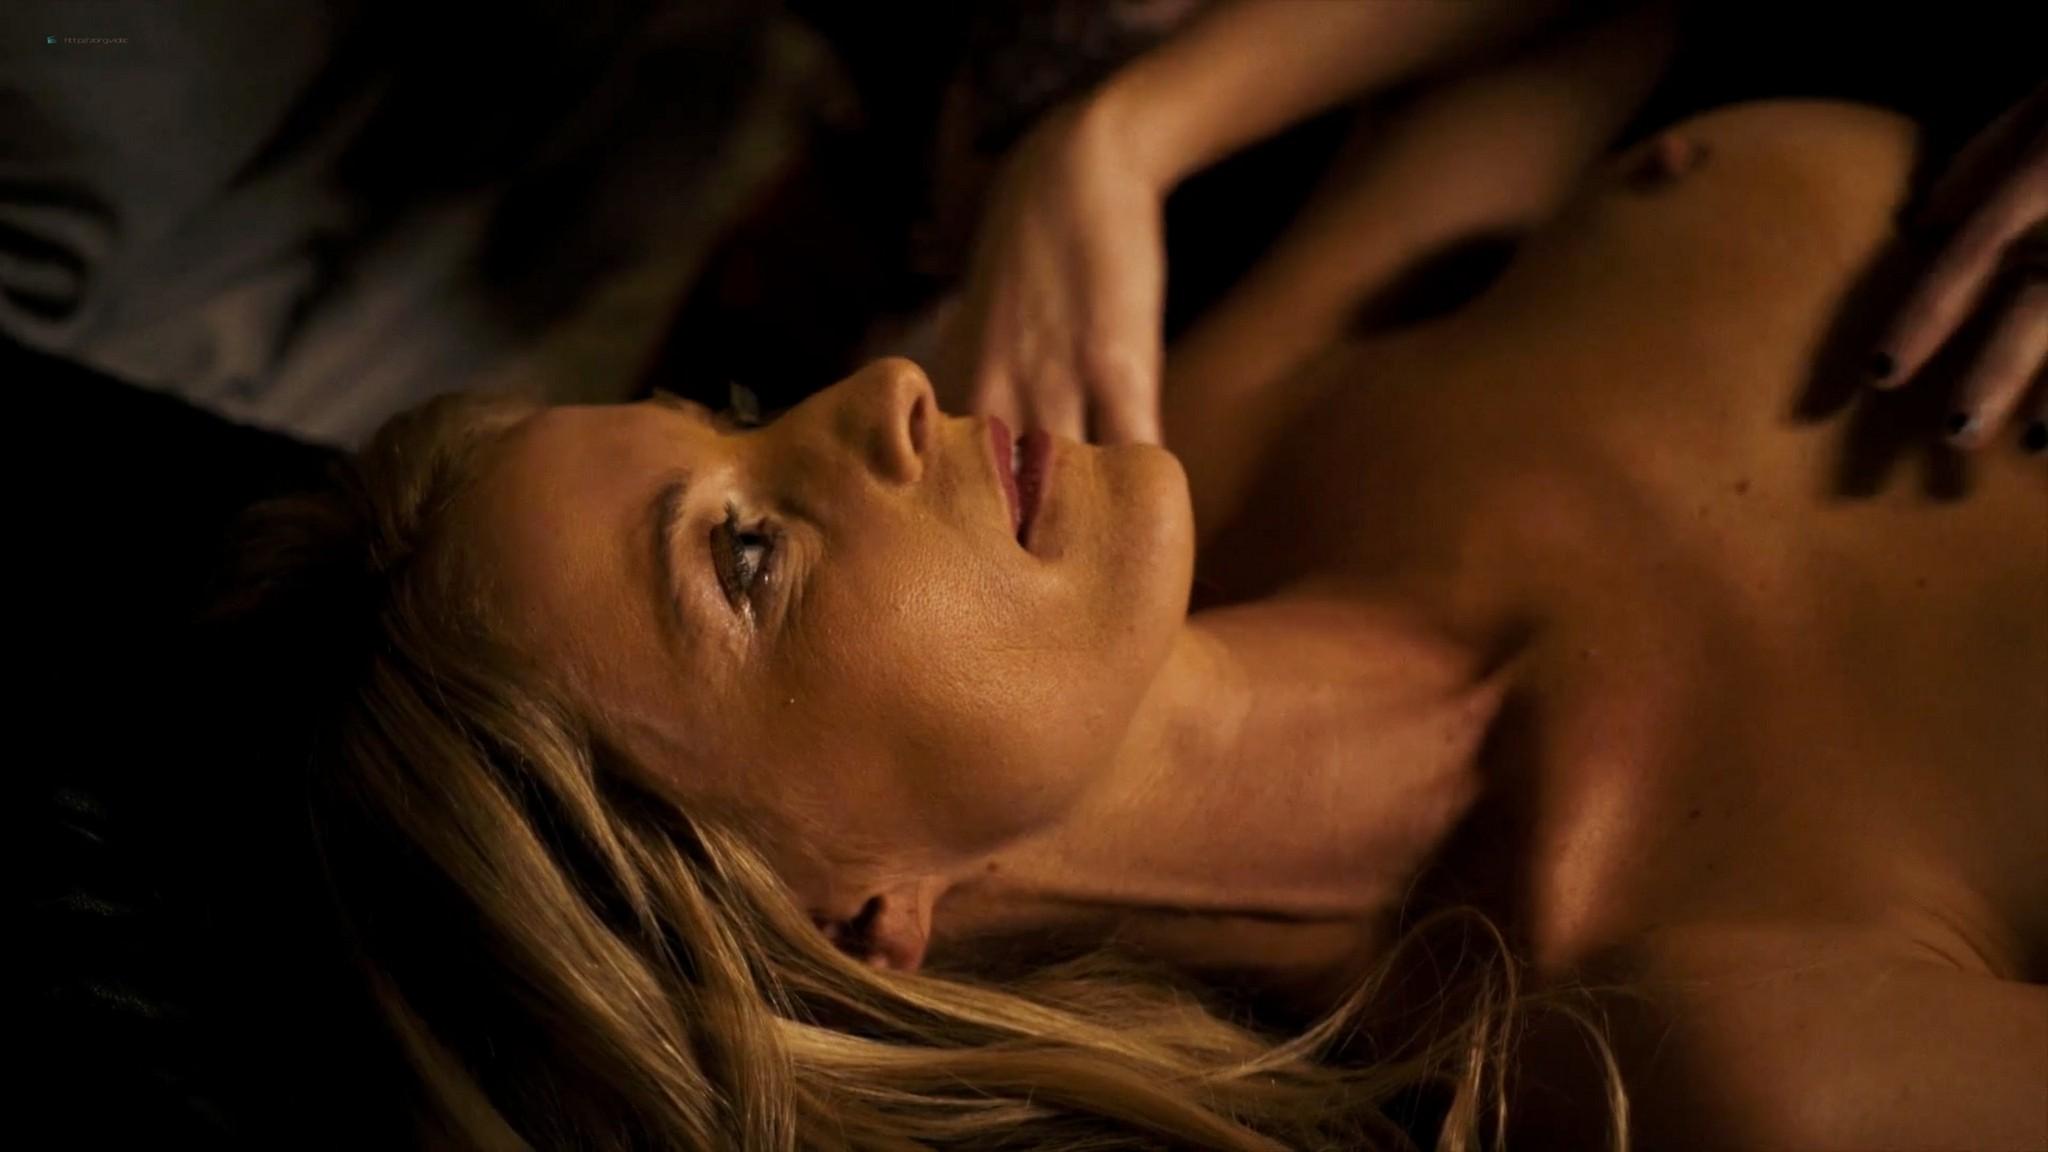 Sadie Katz nude lesbian sex with Victoria De Mare - Hanukkah (2019) HD 1080p Web (15)